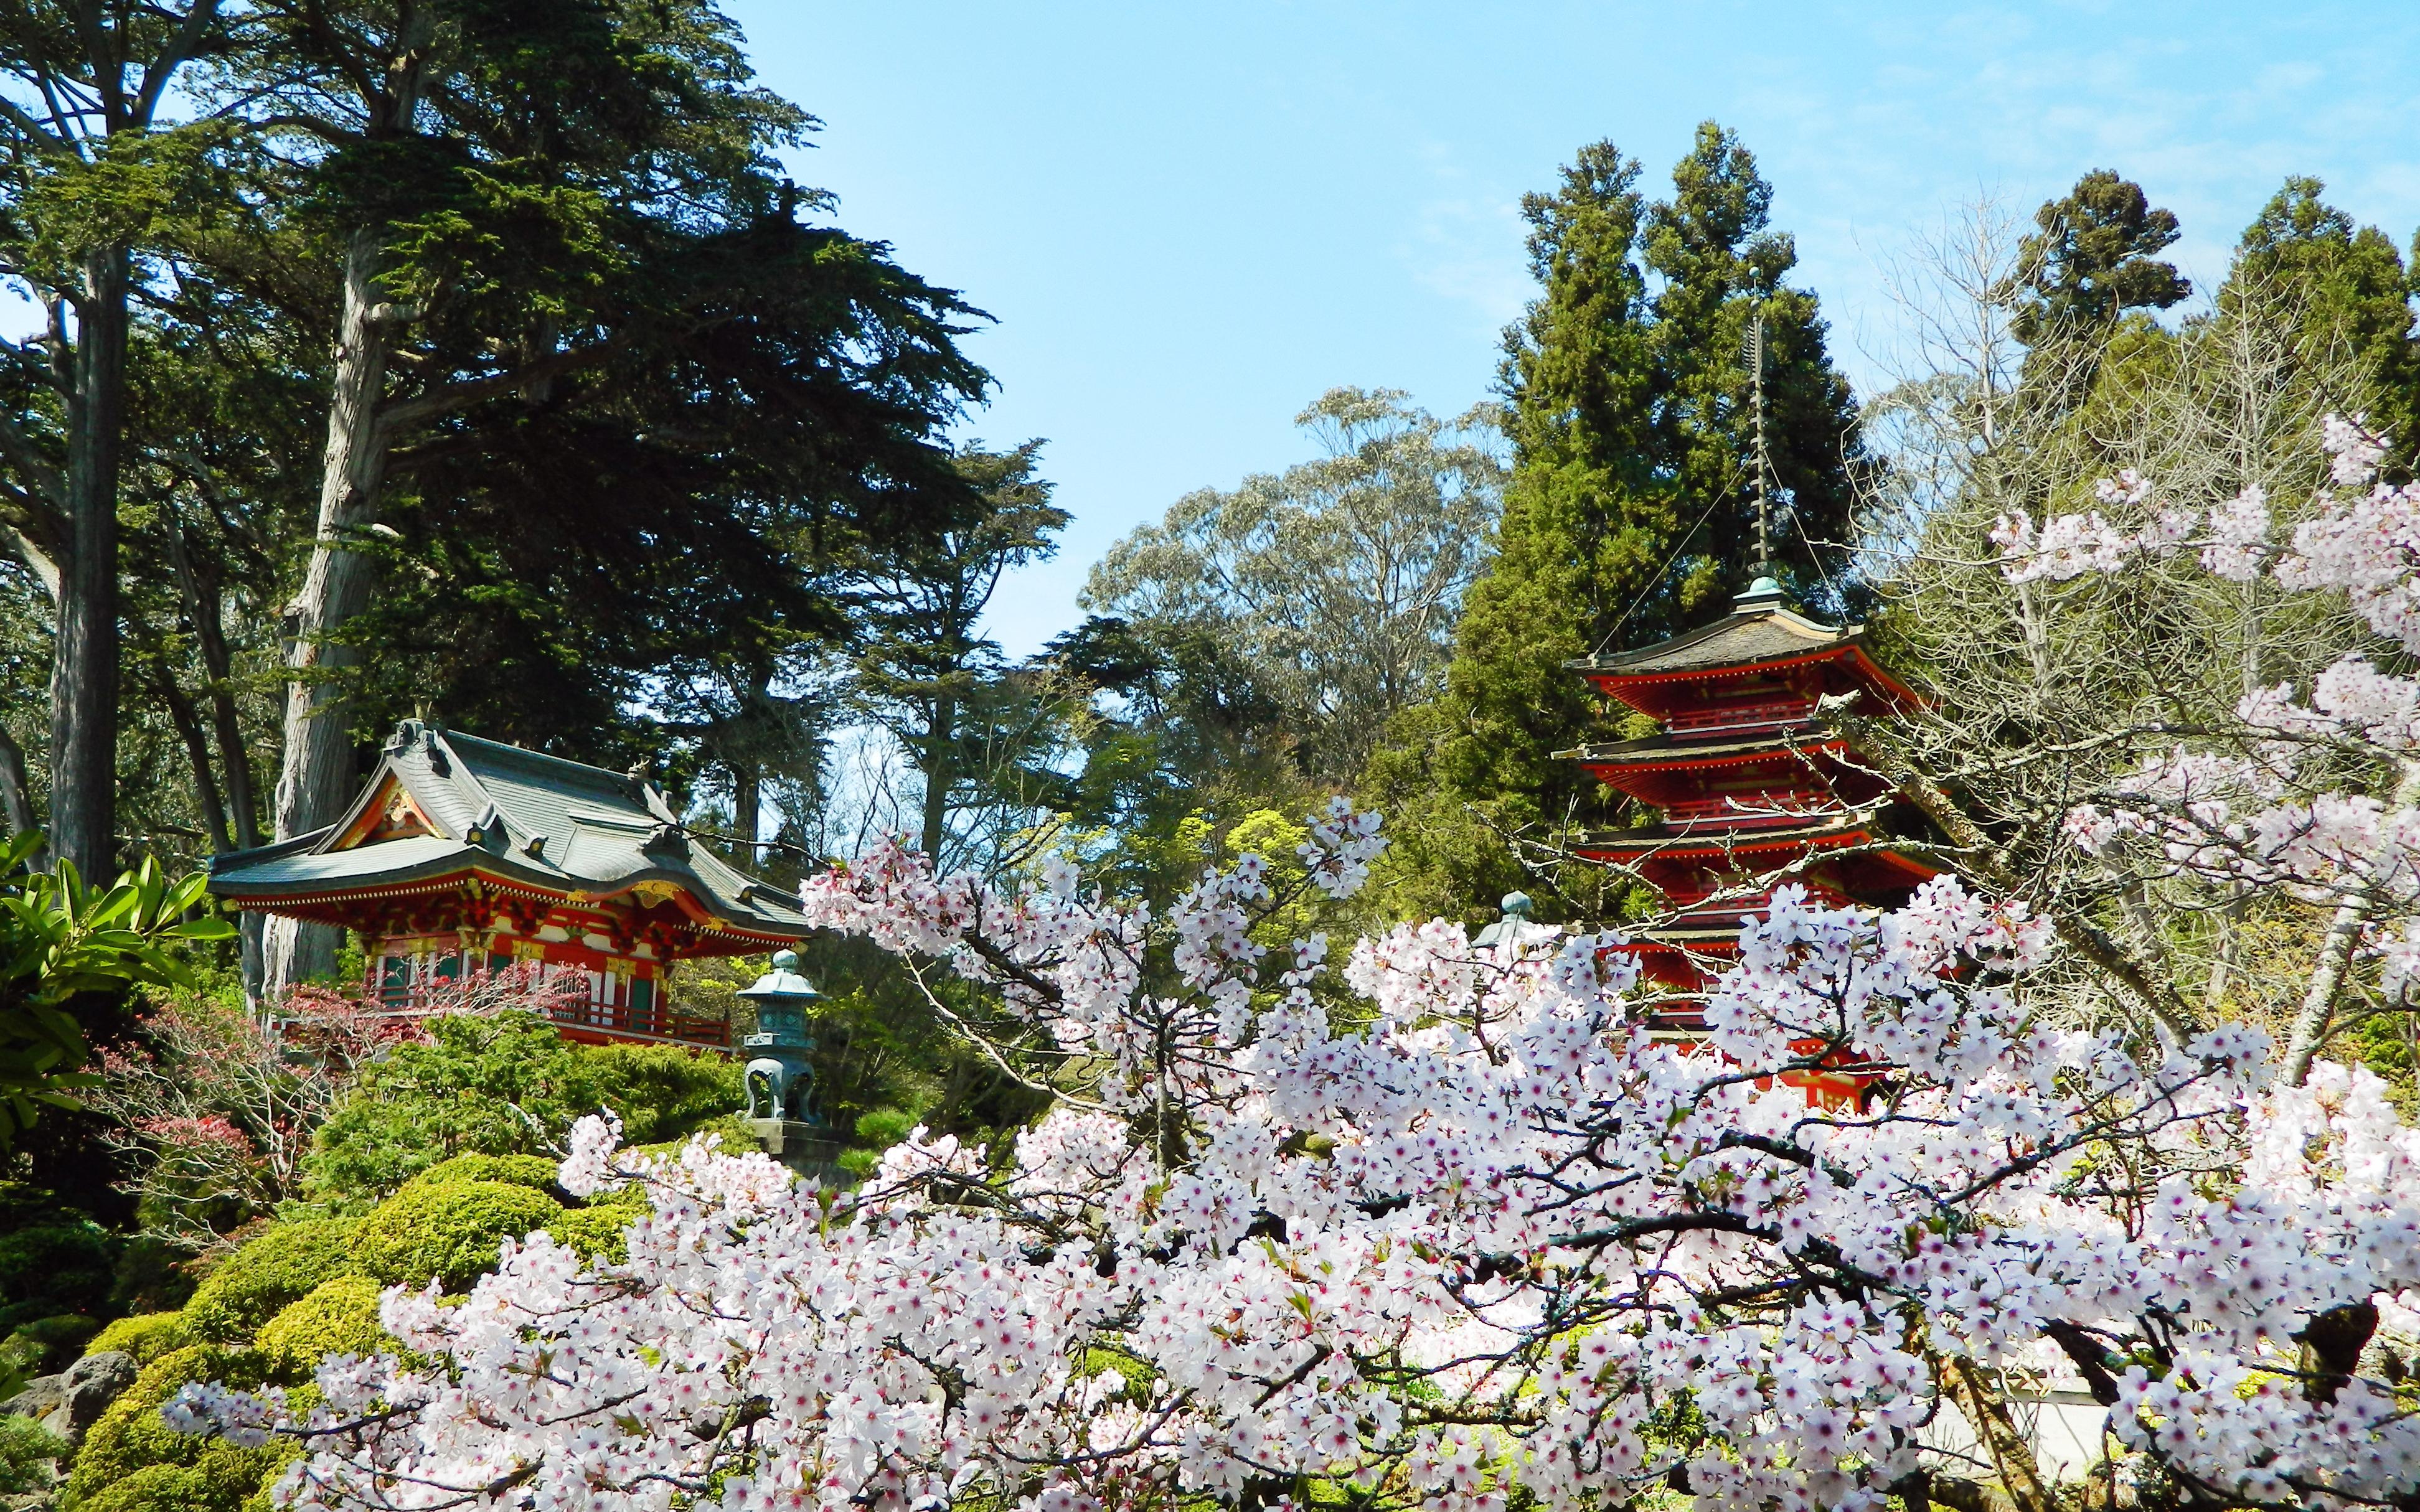 Sakura At The Japanese Tea Gardens By Bahr3dcg On Deviantart